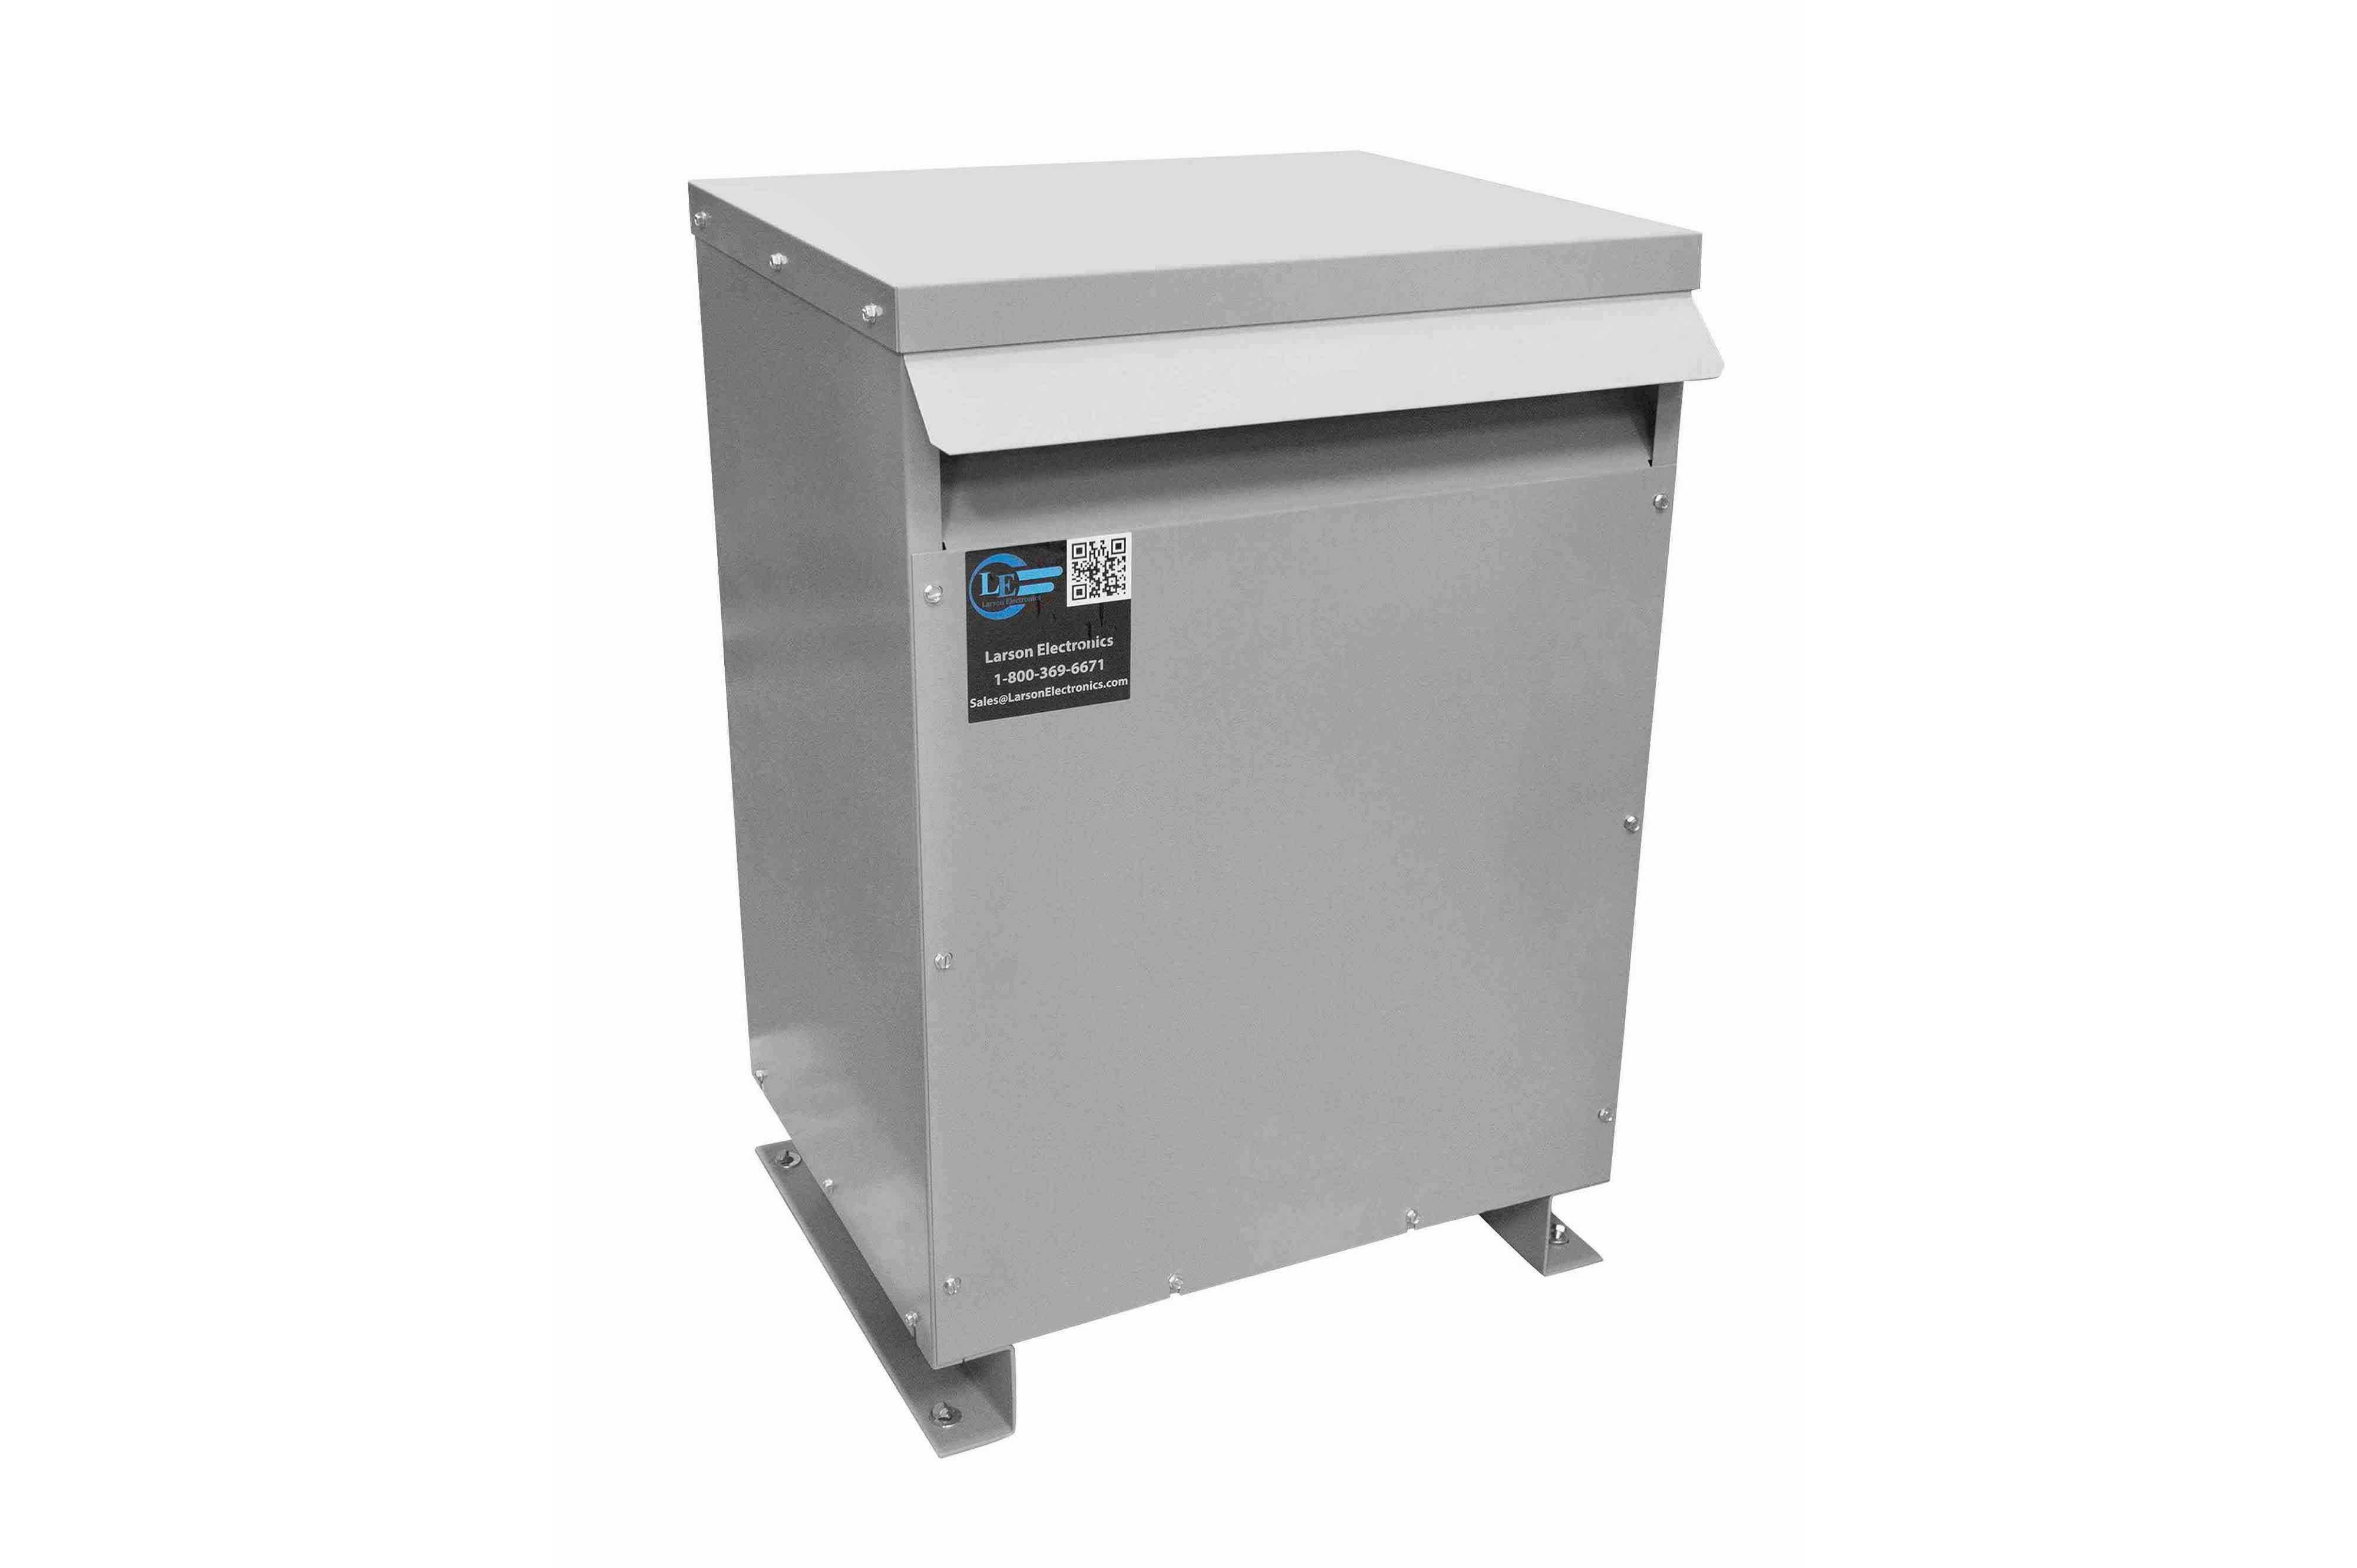 237.5 kVA 3PH Isolation Transformer, 600V Wye Primary, 415Y/240 Wye-N Secondary, N3R, Ventilated, 60 Hz